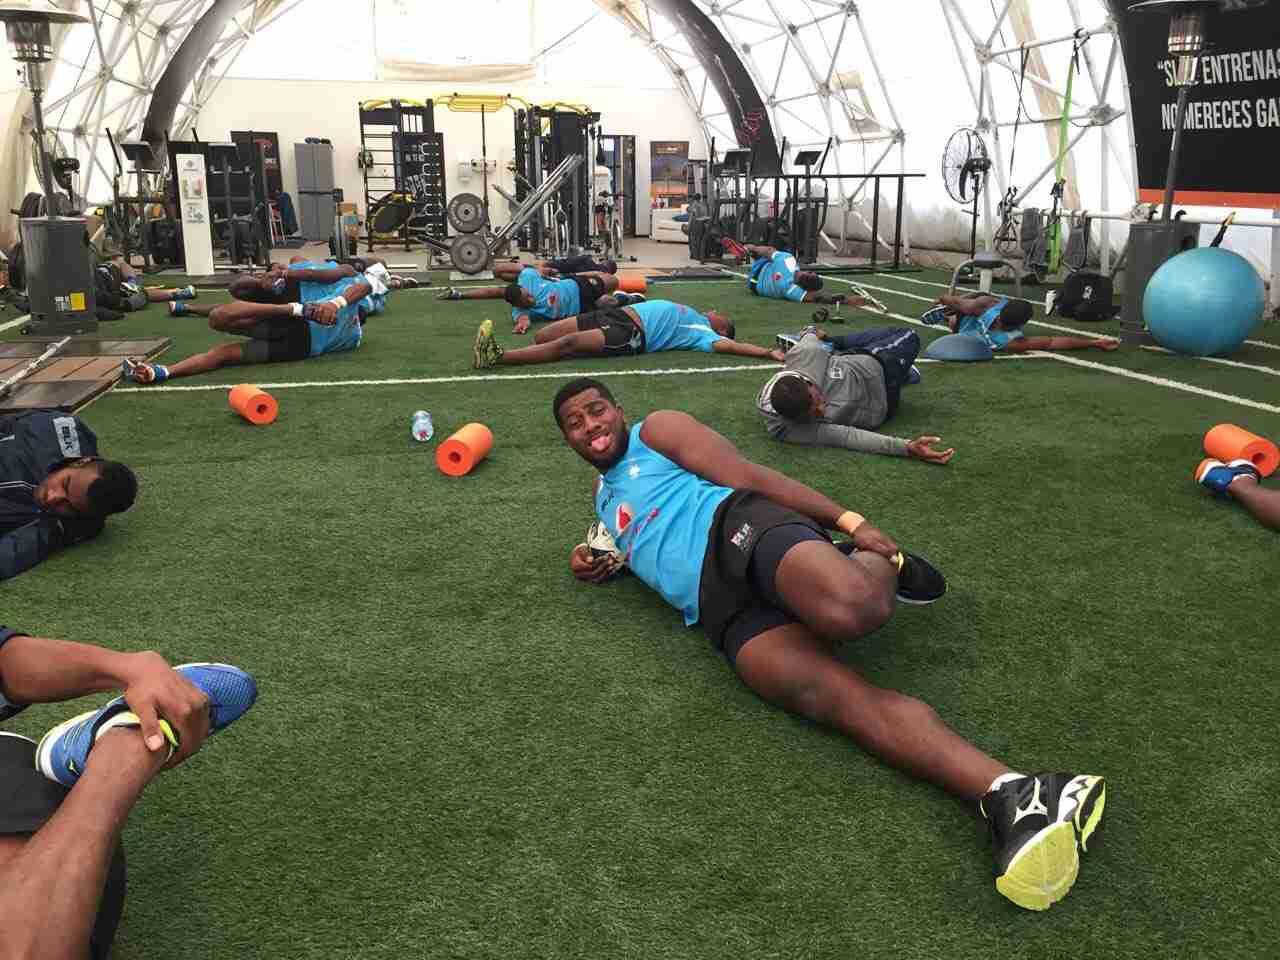 Fiji 7s final preparations in Chile : Rio 2016 Olympics